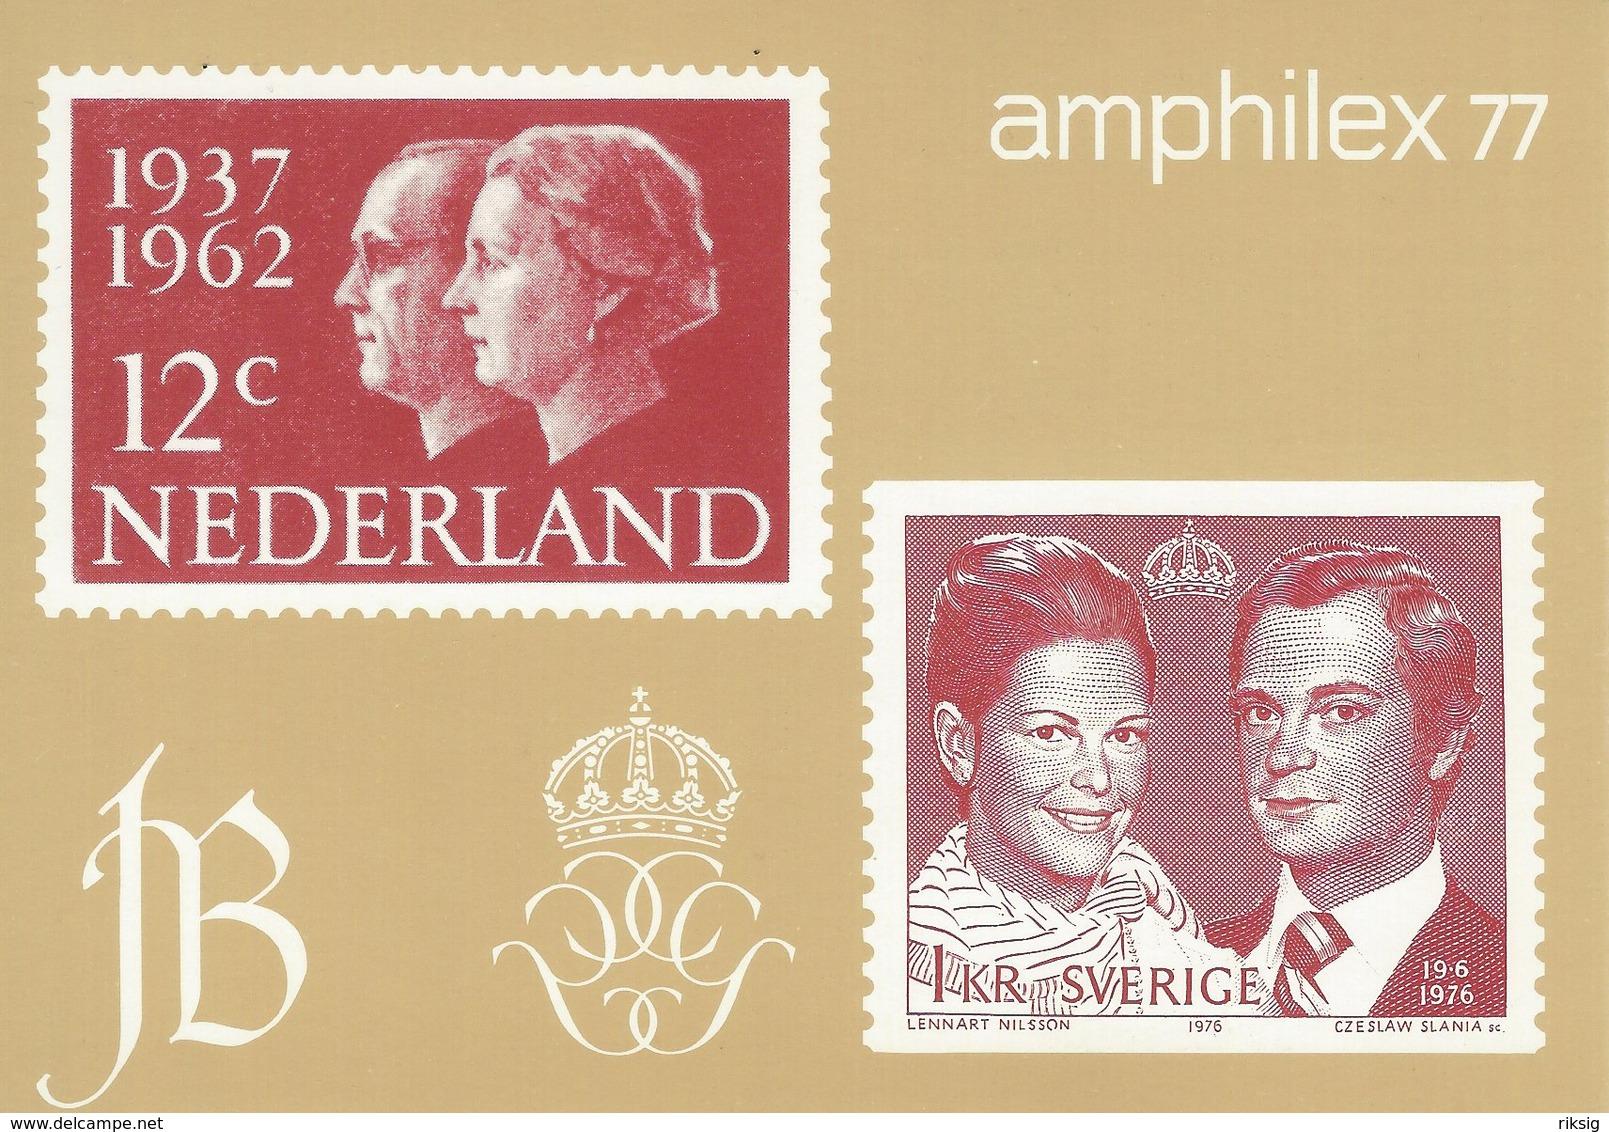 Amphilex 77. Stamp Exhibition. B-3310 - Stamps (pictures)